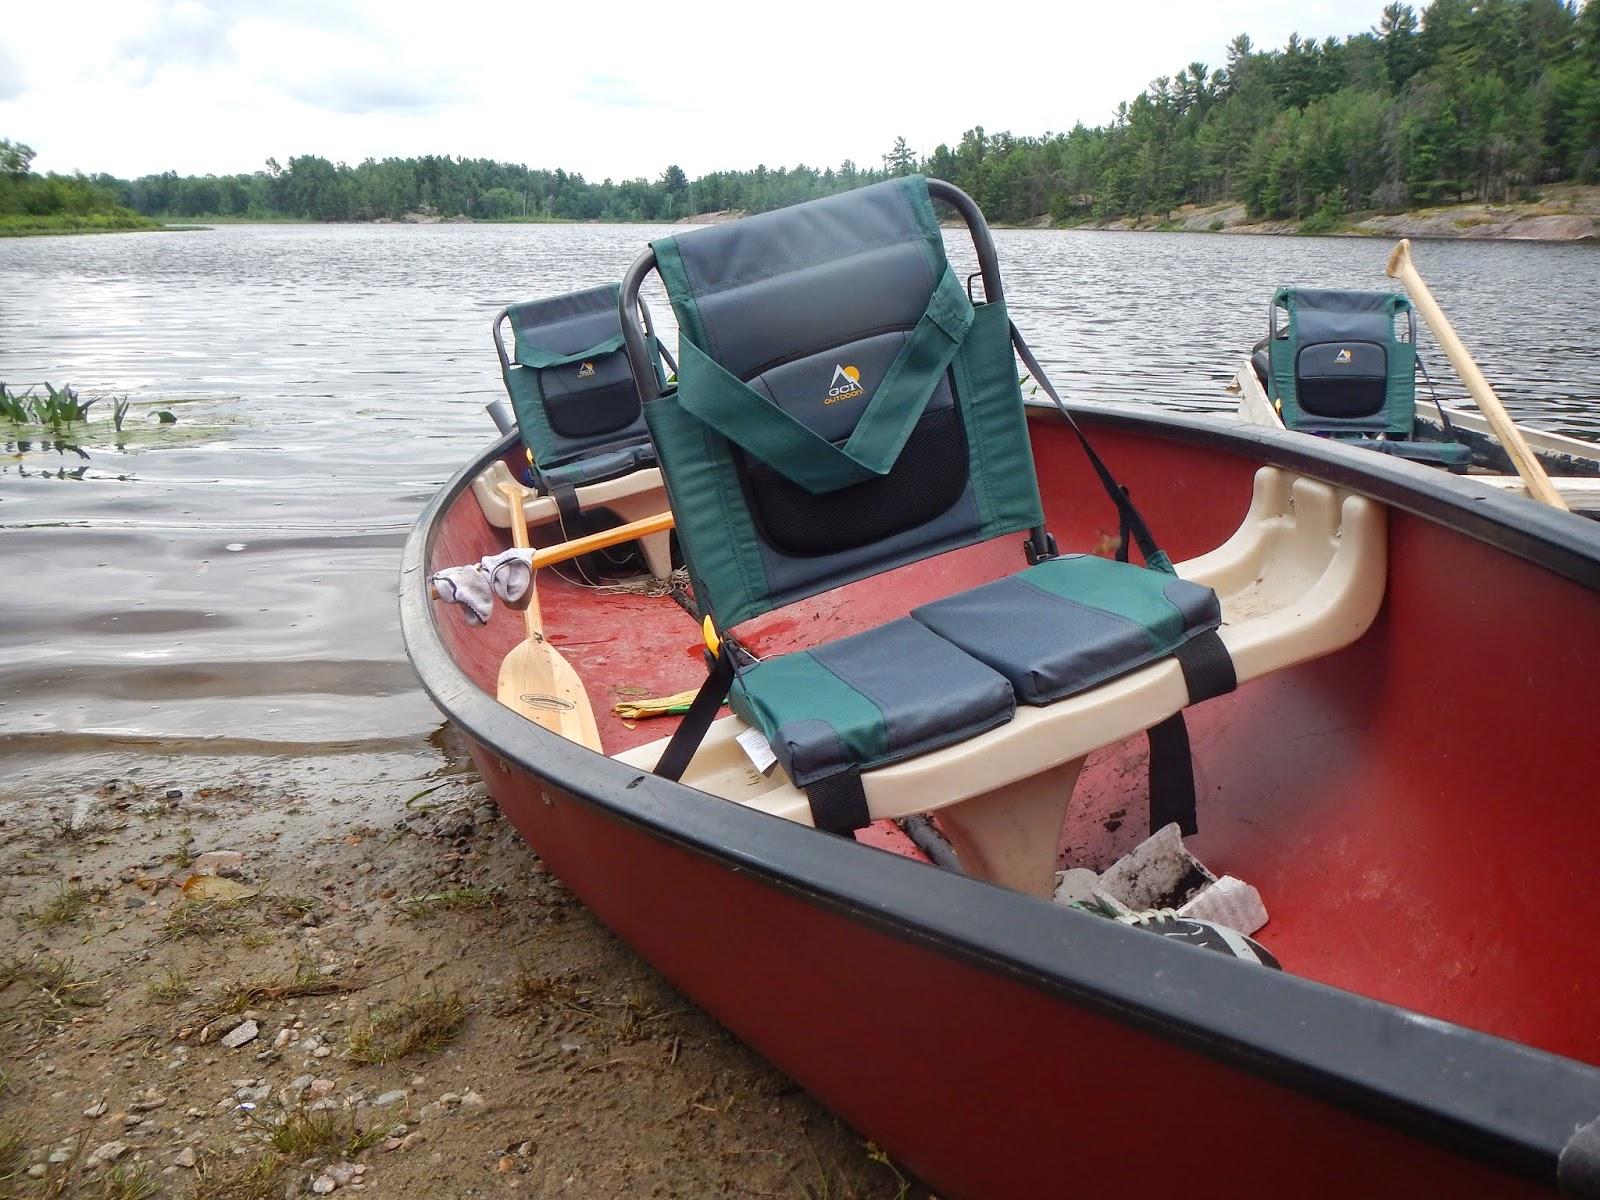 Canoe seats